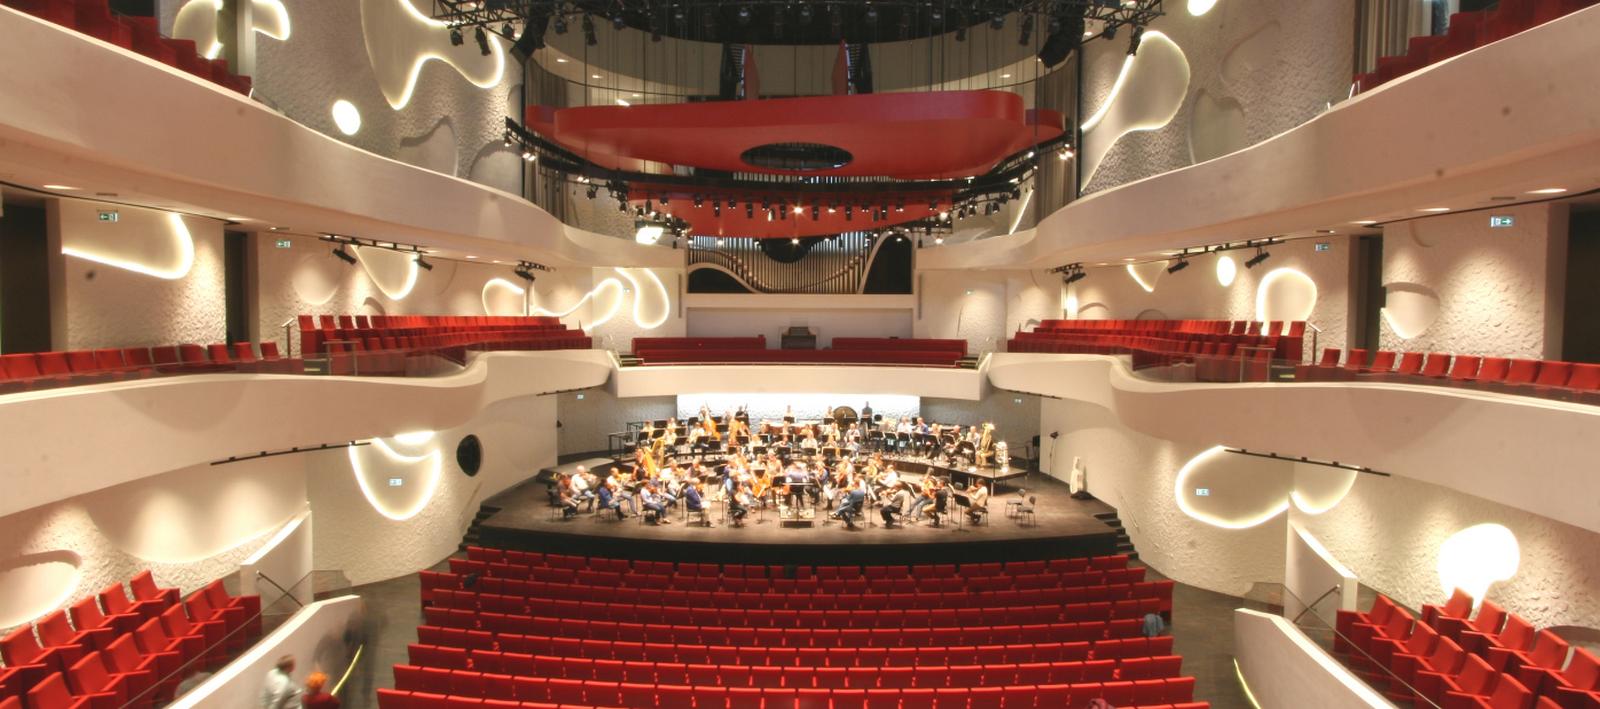 House of Music, Aalborg - Sheet3